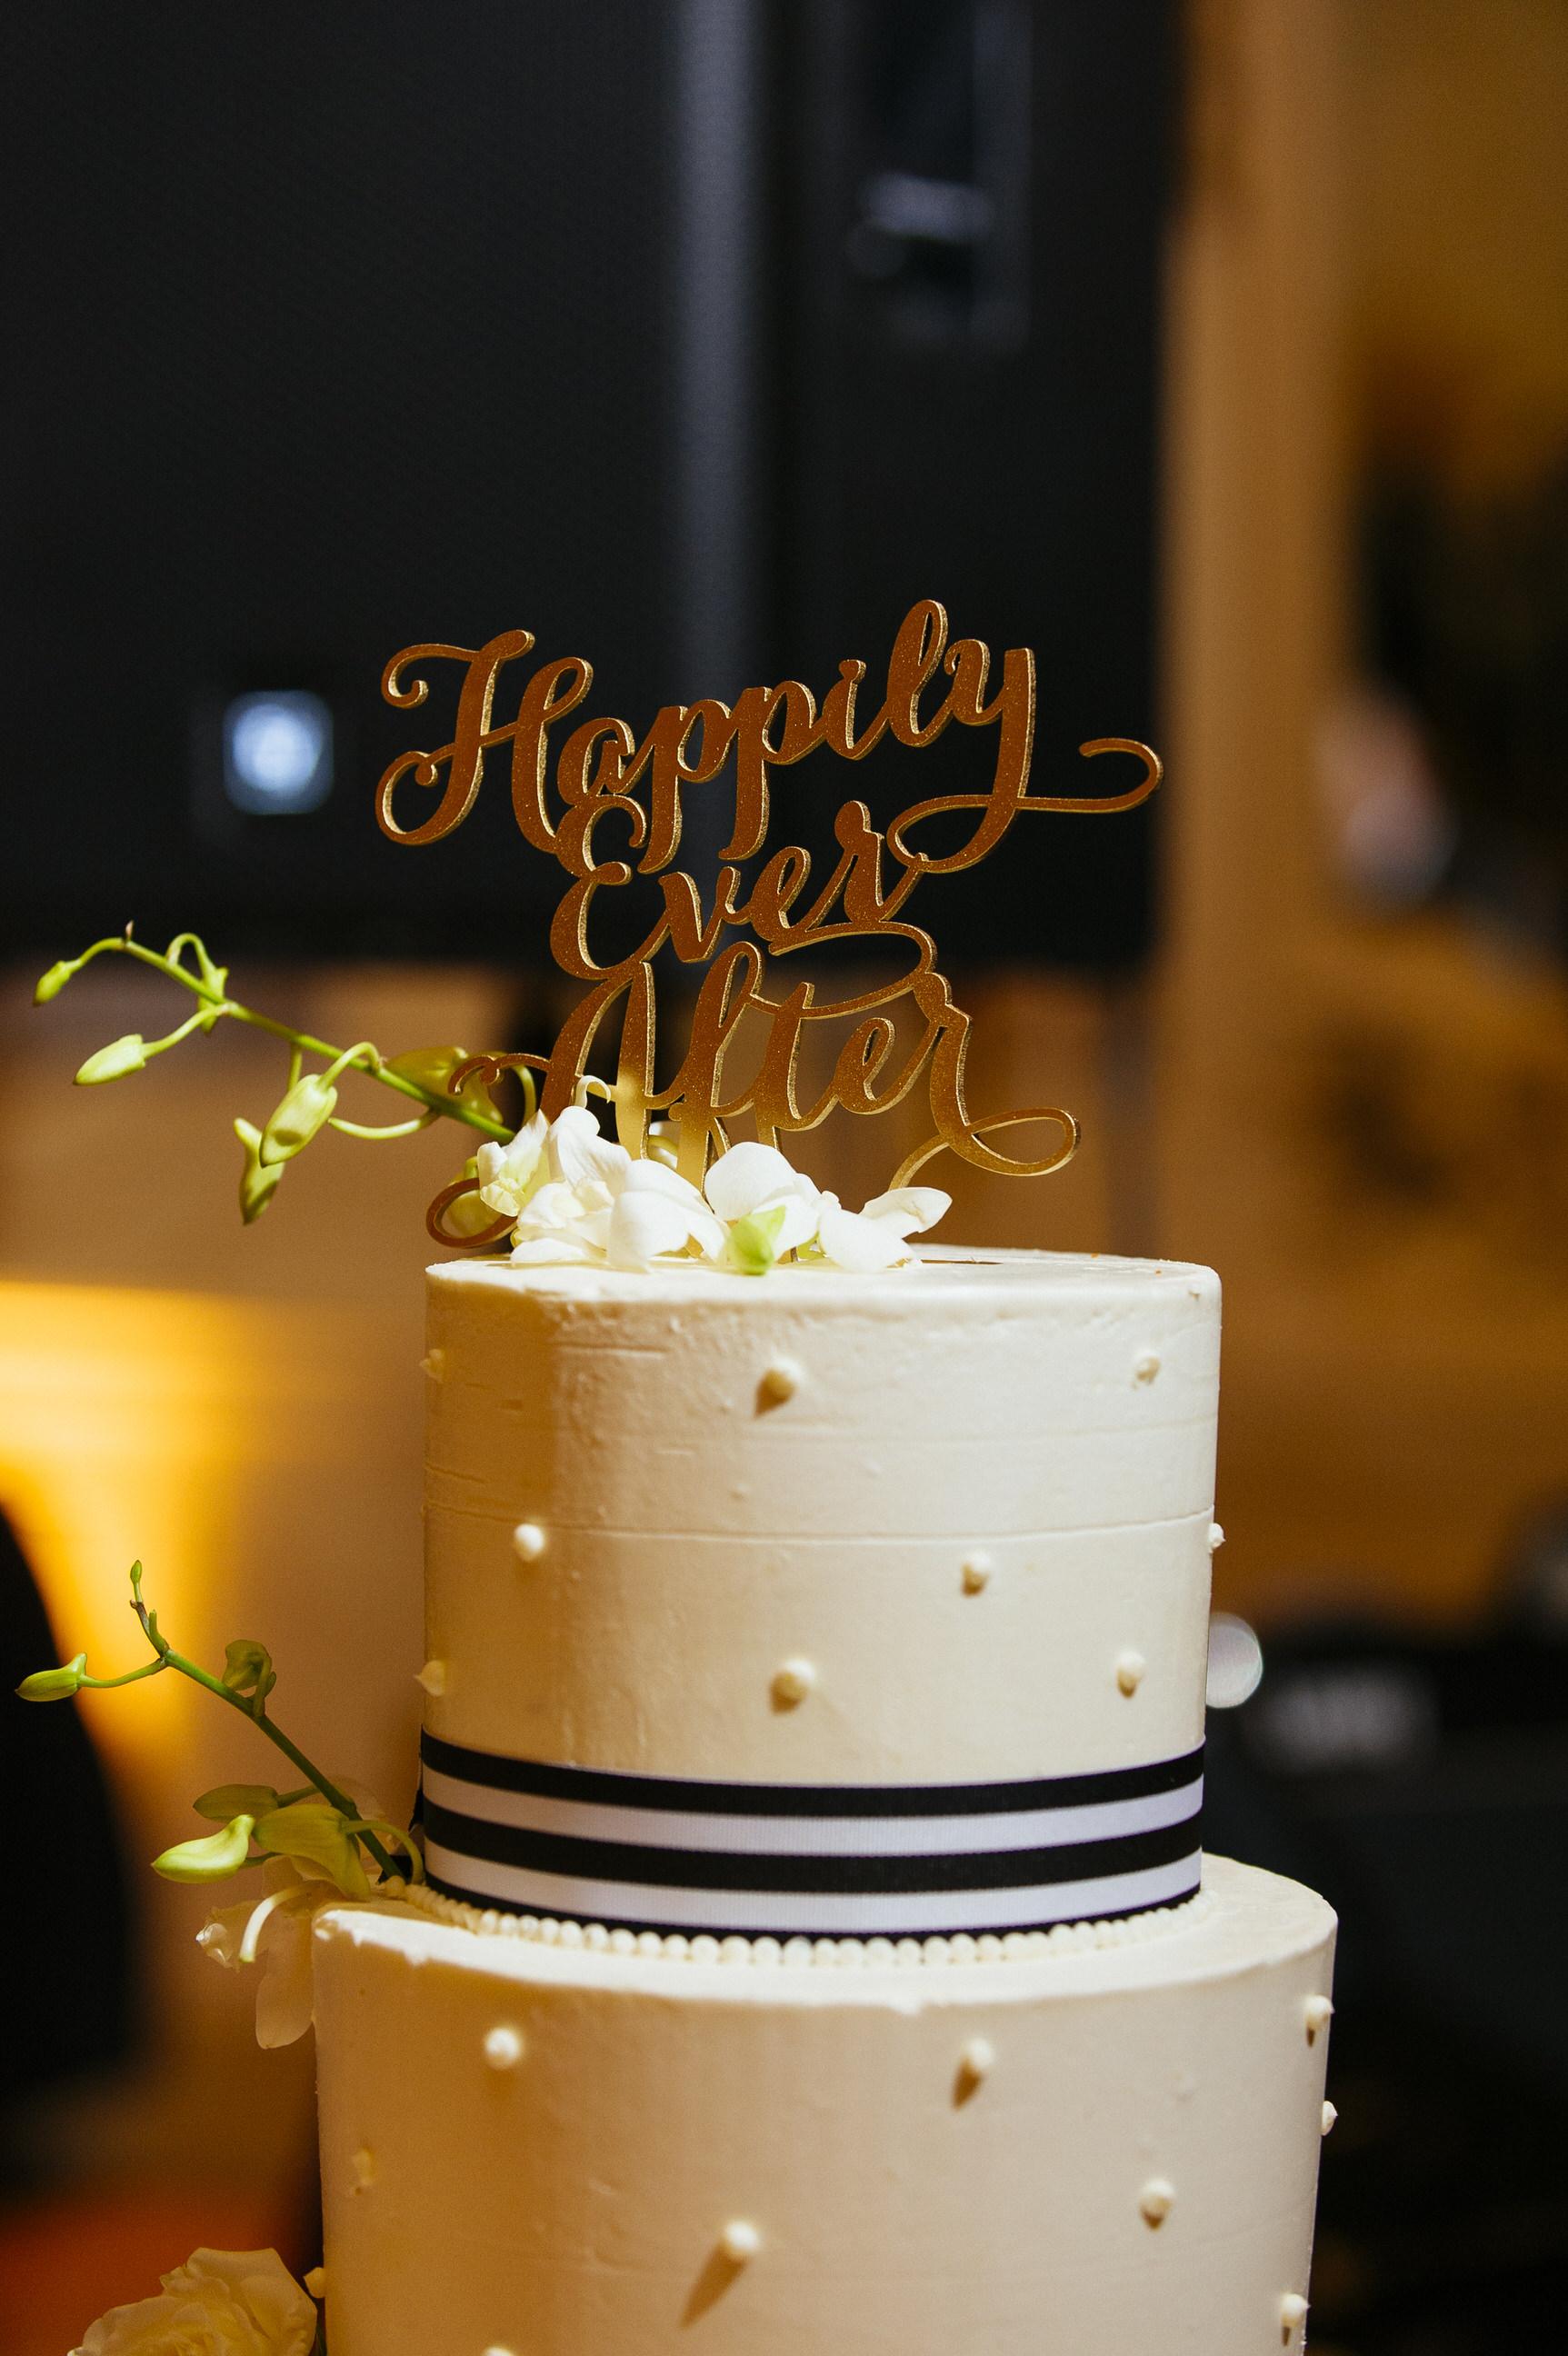 27 Hotel DuPont Wedding Cake Desserts by Dana Black and White Wedding.jpg